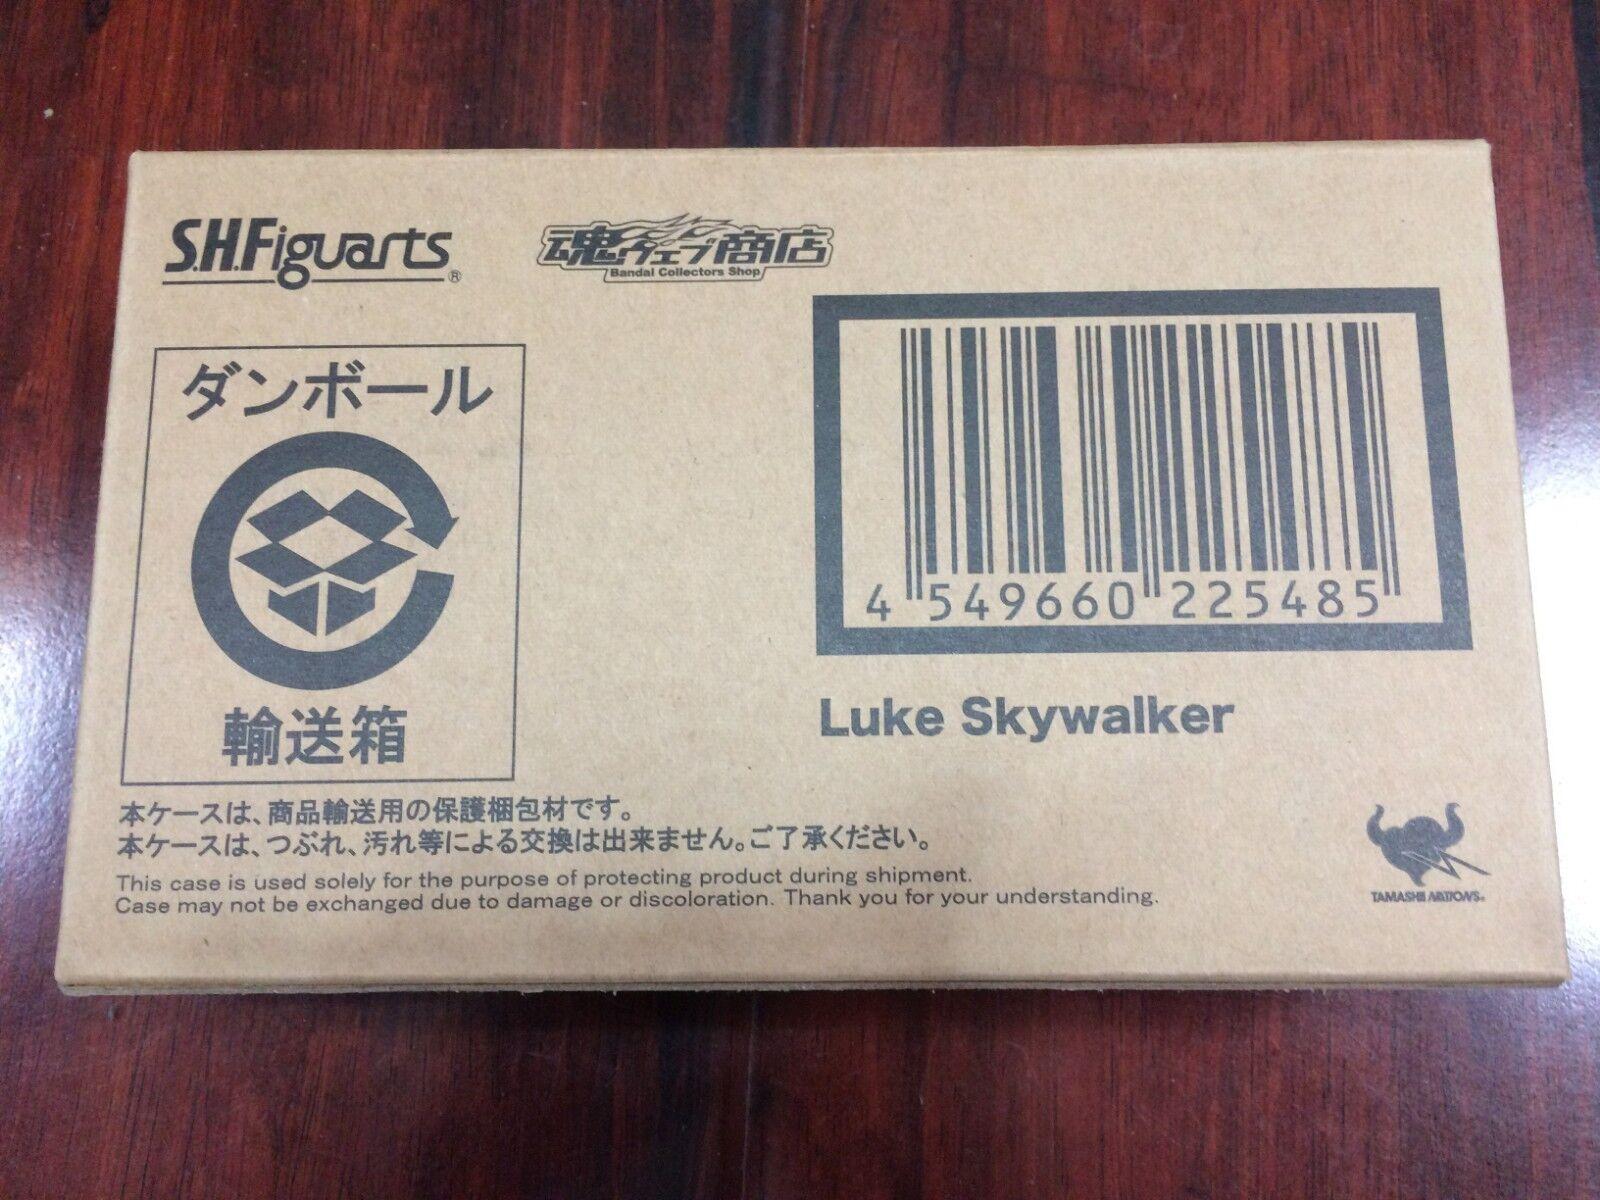 Luke Skywalker - Bandai S.H. Figuarts The Last Jedi Tamashii Tamashii Tamashii Web Exclusive 46e971